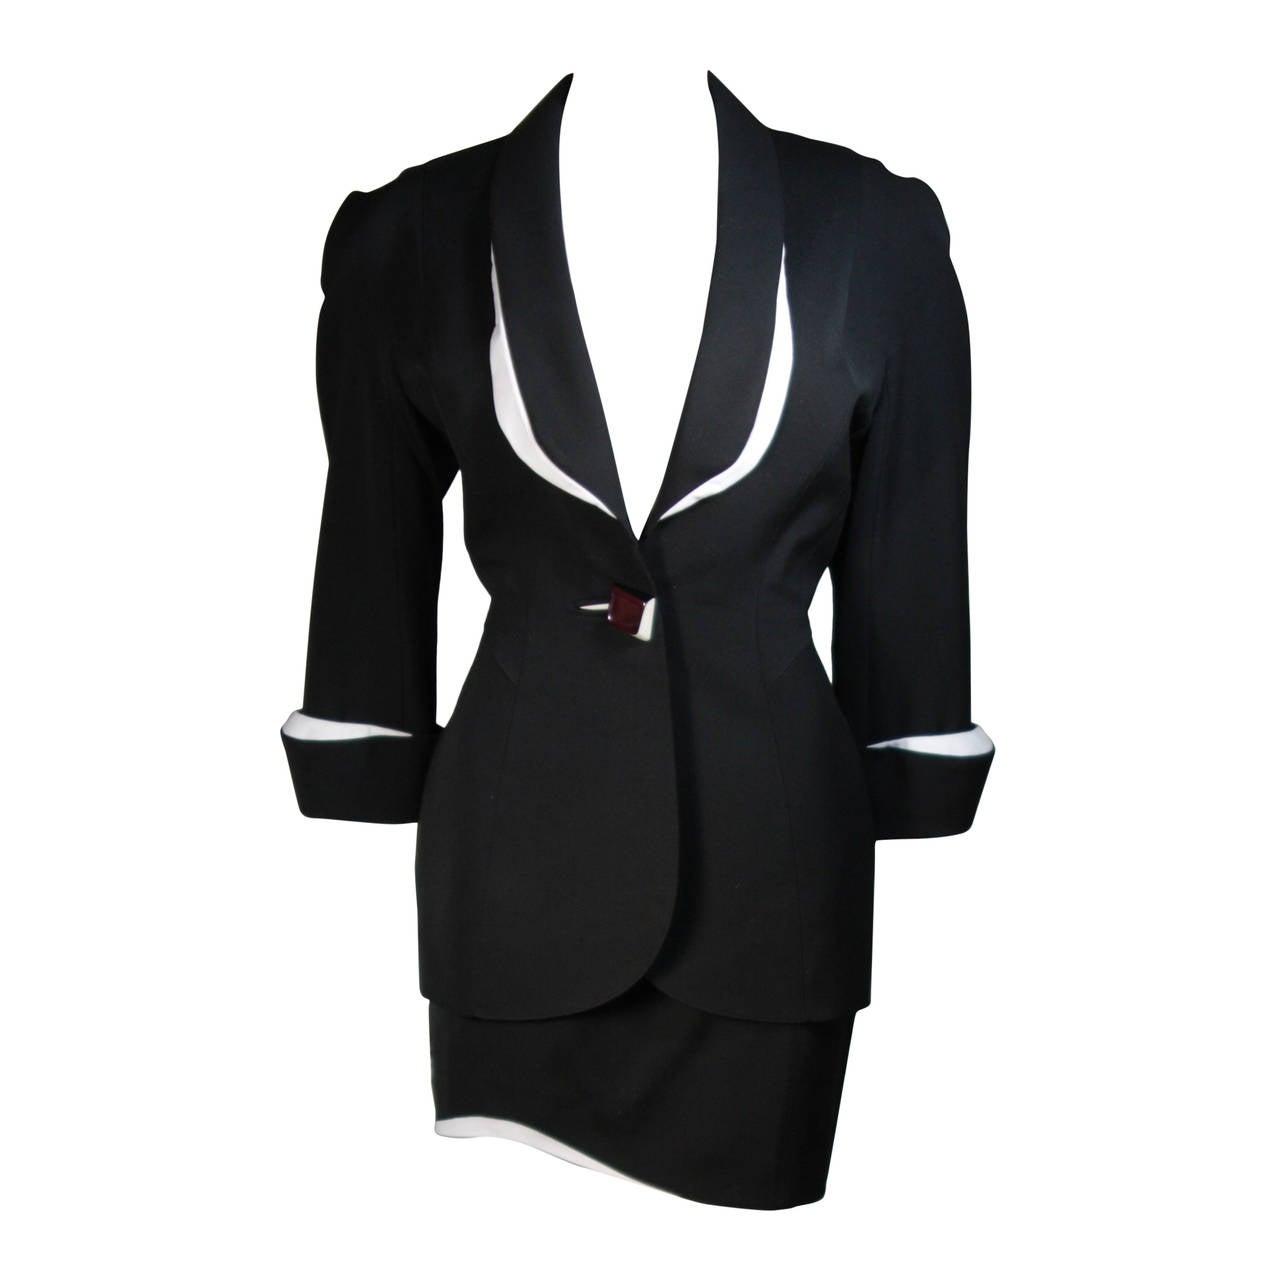 Thierry Mugler Black & White Skirt Suit w.Three Dimensional Lapel & Cuff detail